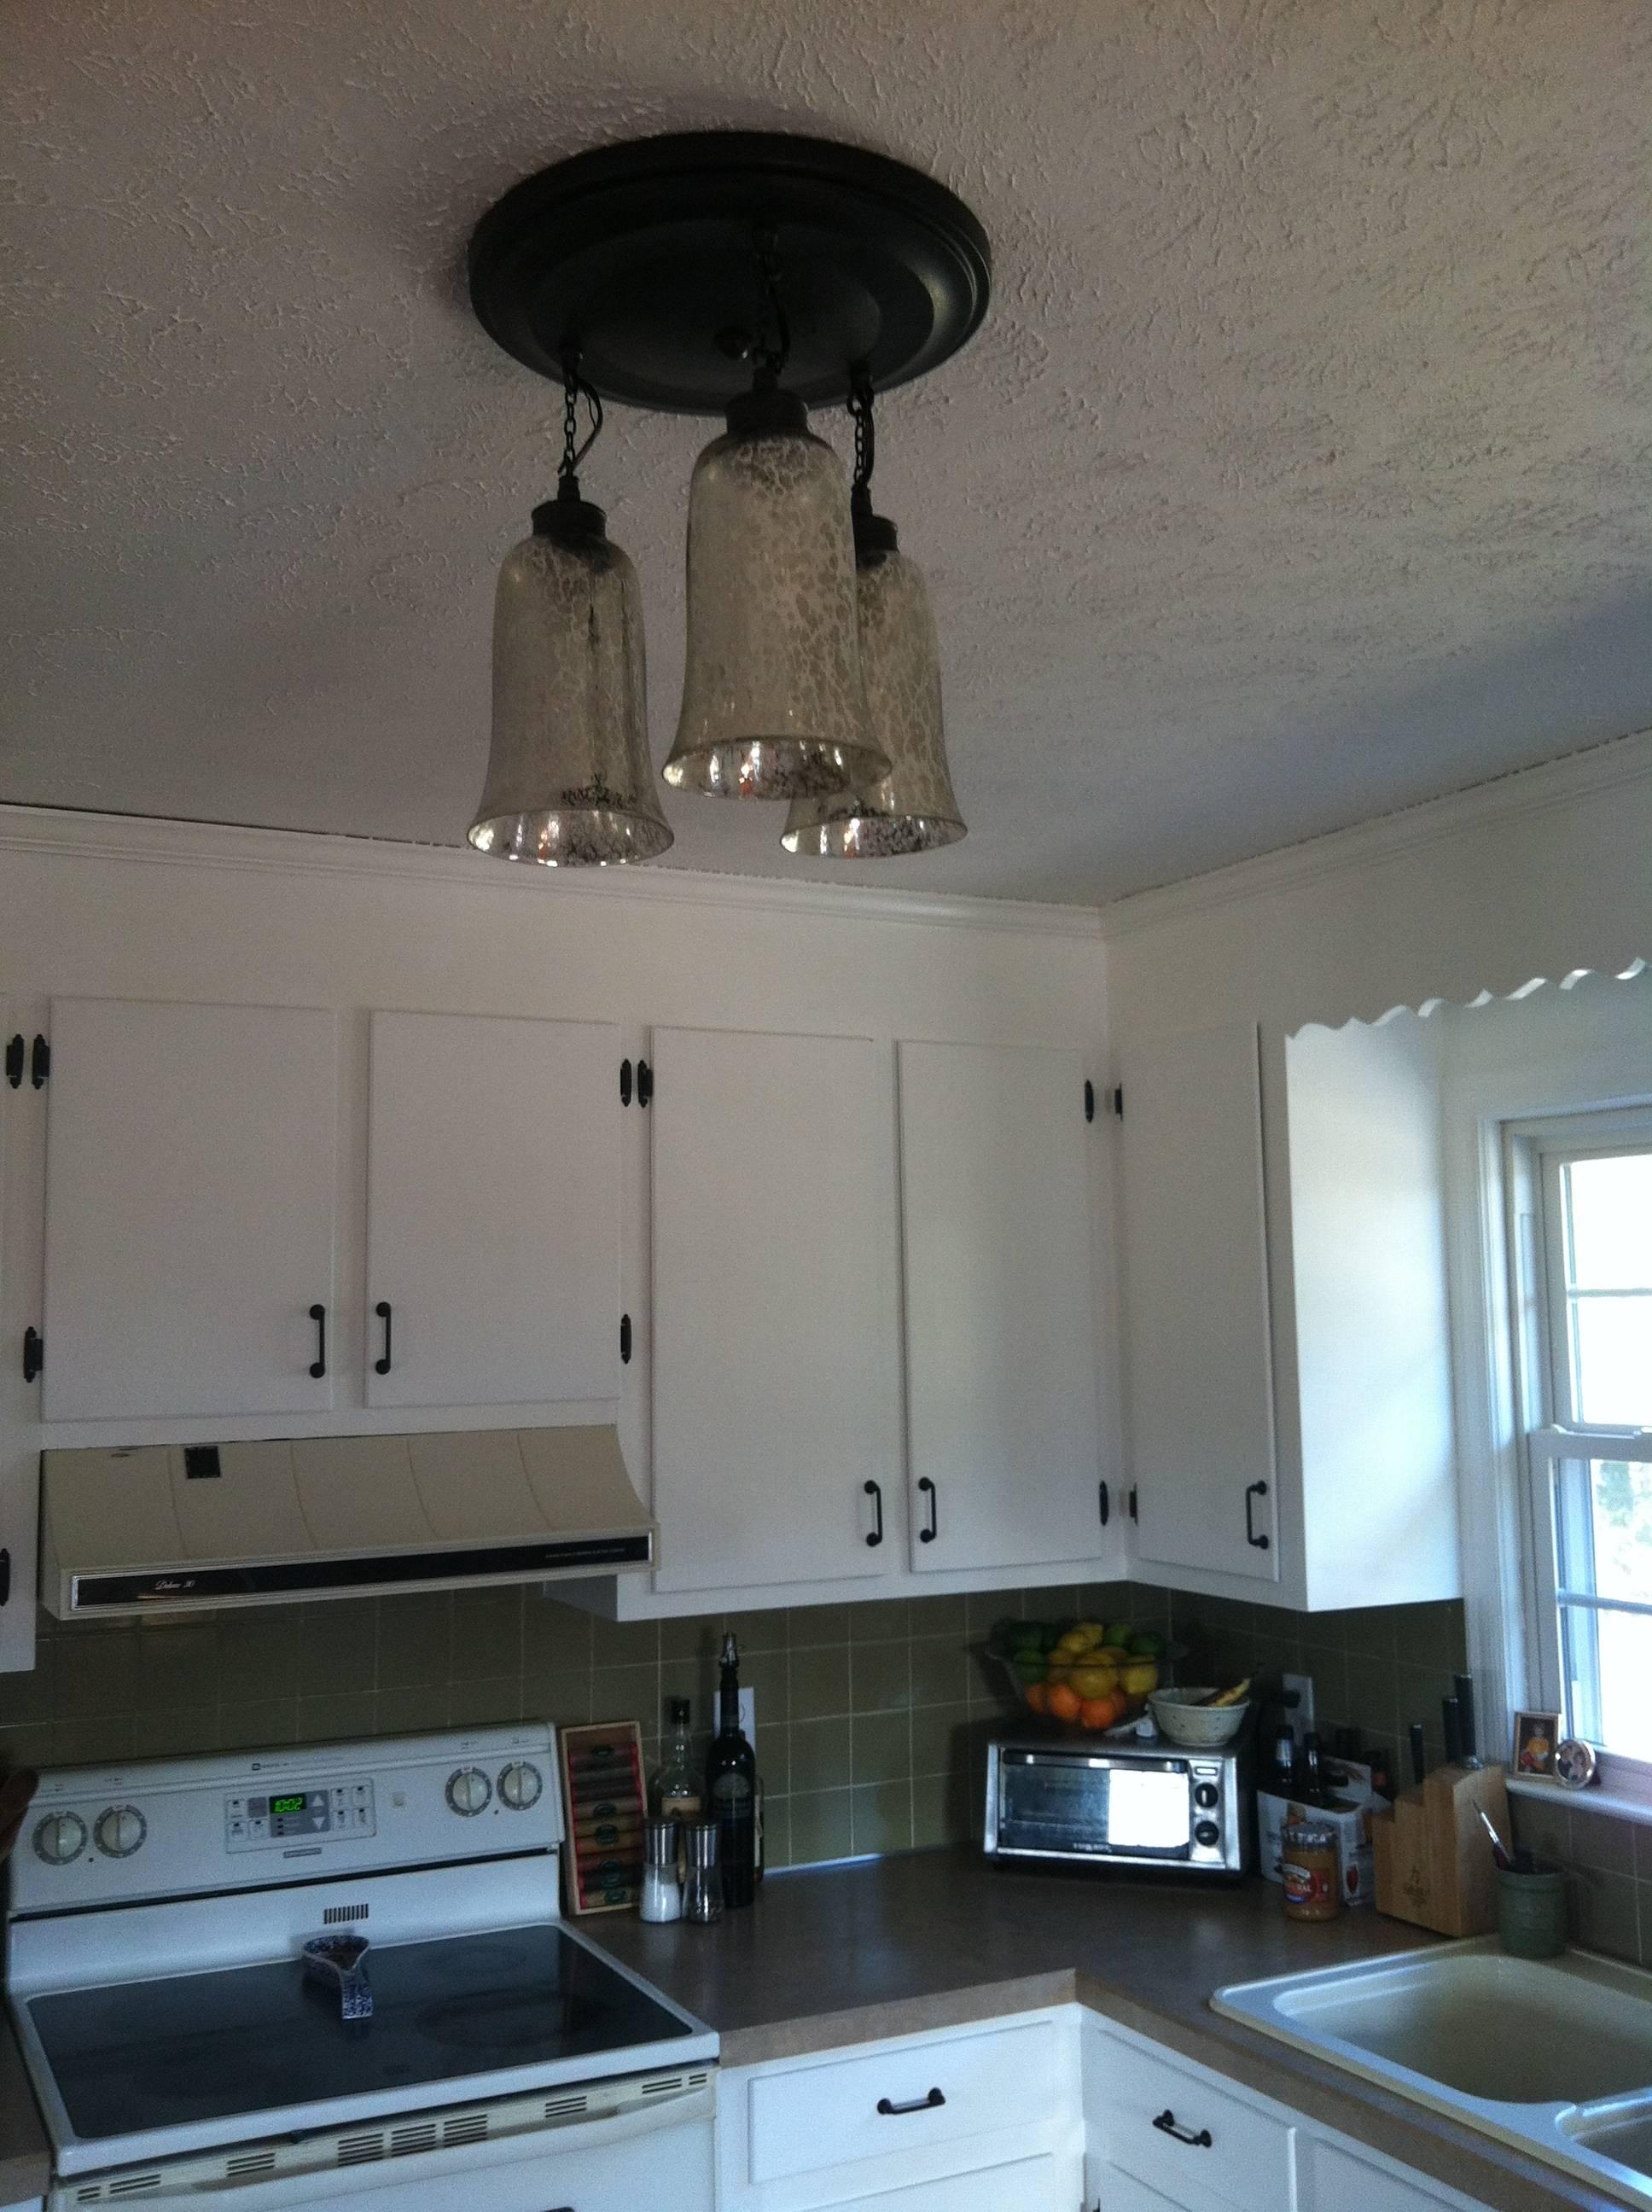 Light Fixtures | Small, But Valuable. regarding Mercury Glass Lights Fixtures (Image 9 of 15)